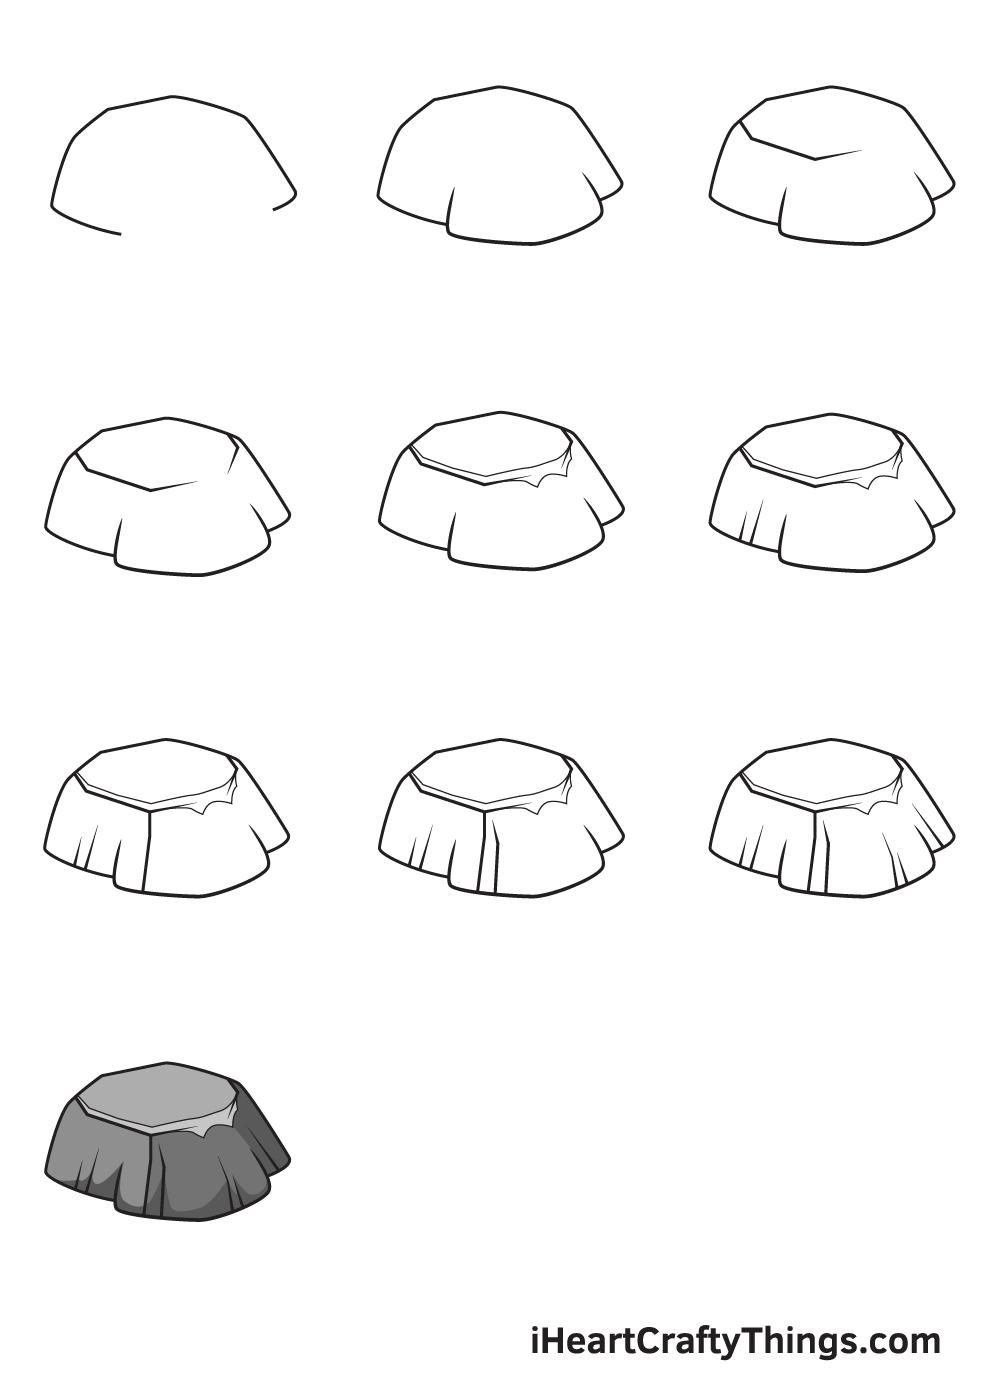 drawing rock in 9 steps